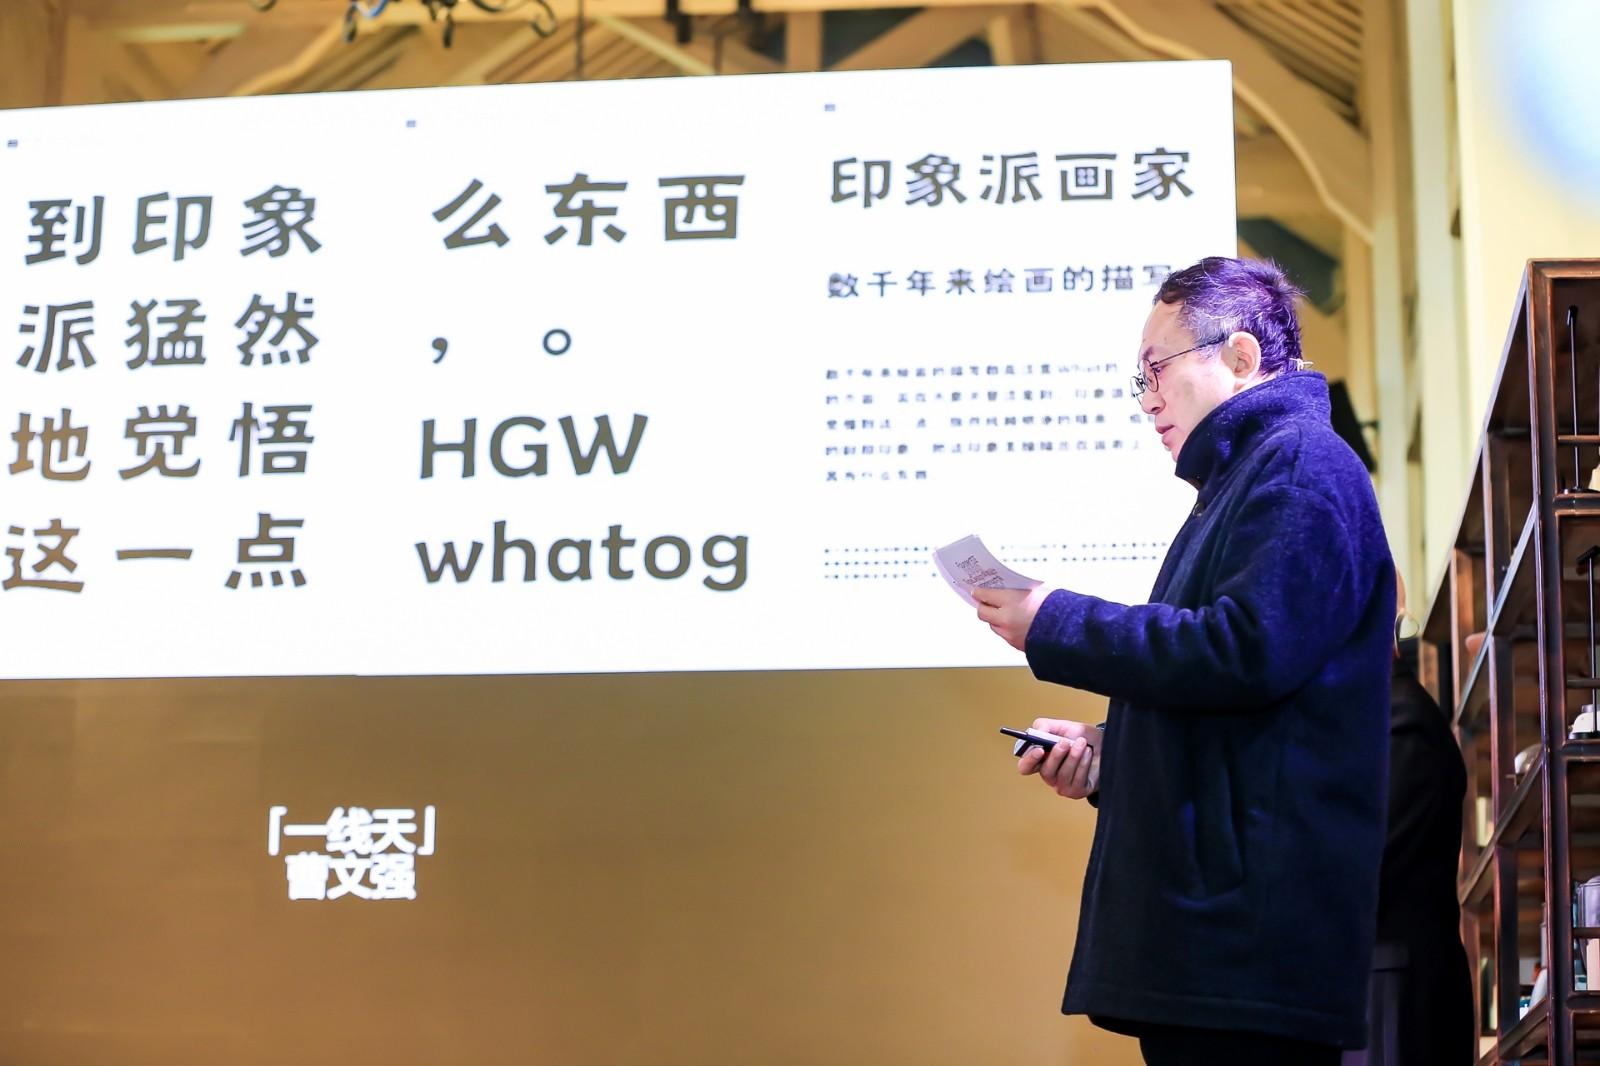 https://ft-bk1.oss-cn-zhangjiakou.aliyuncs.com/Public/Uploads/img/n_content_20201210174148_9711.jpg